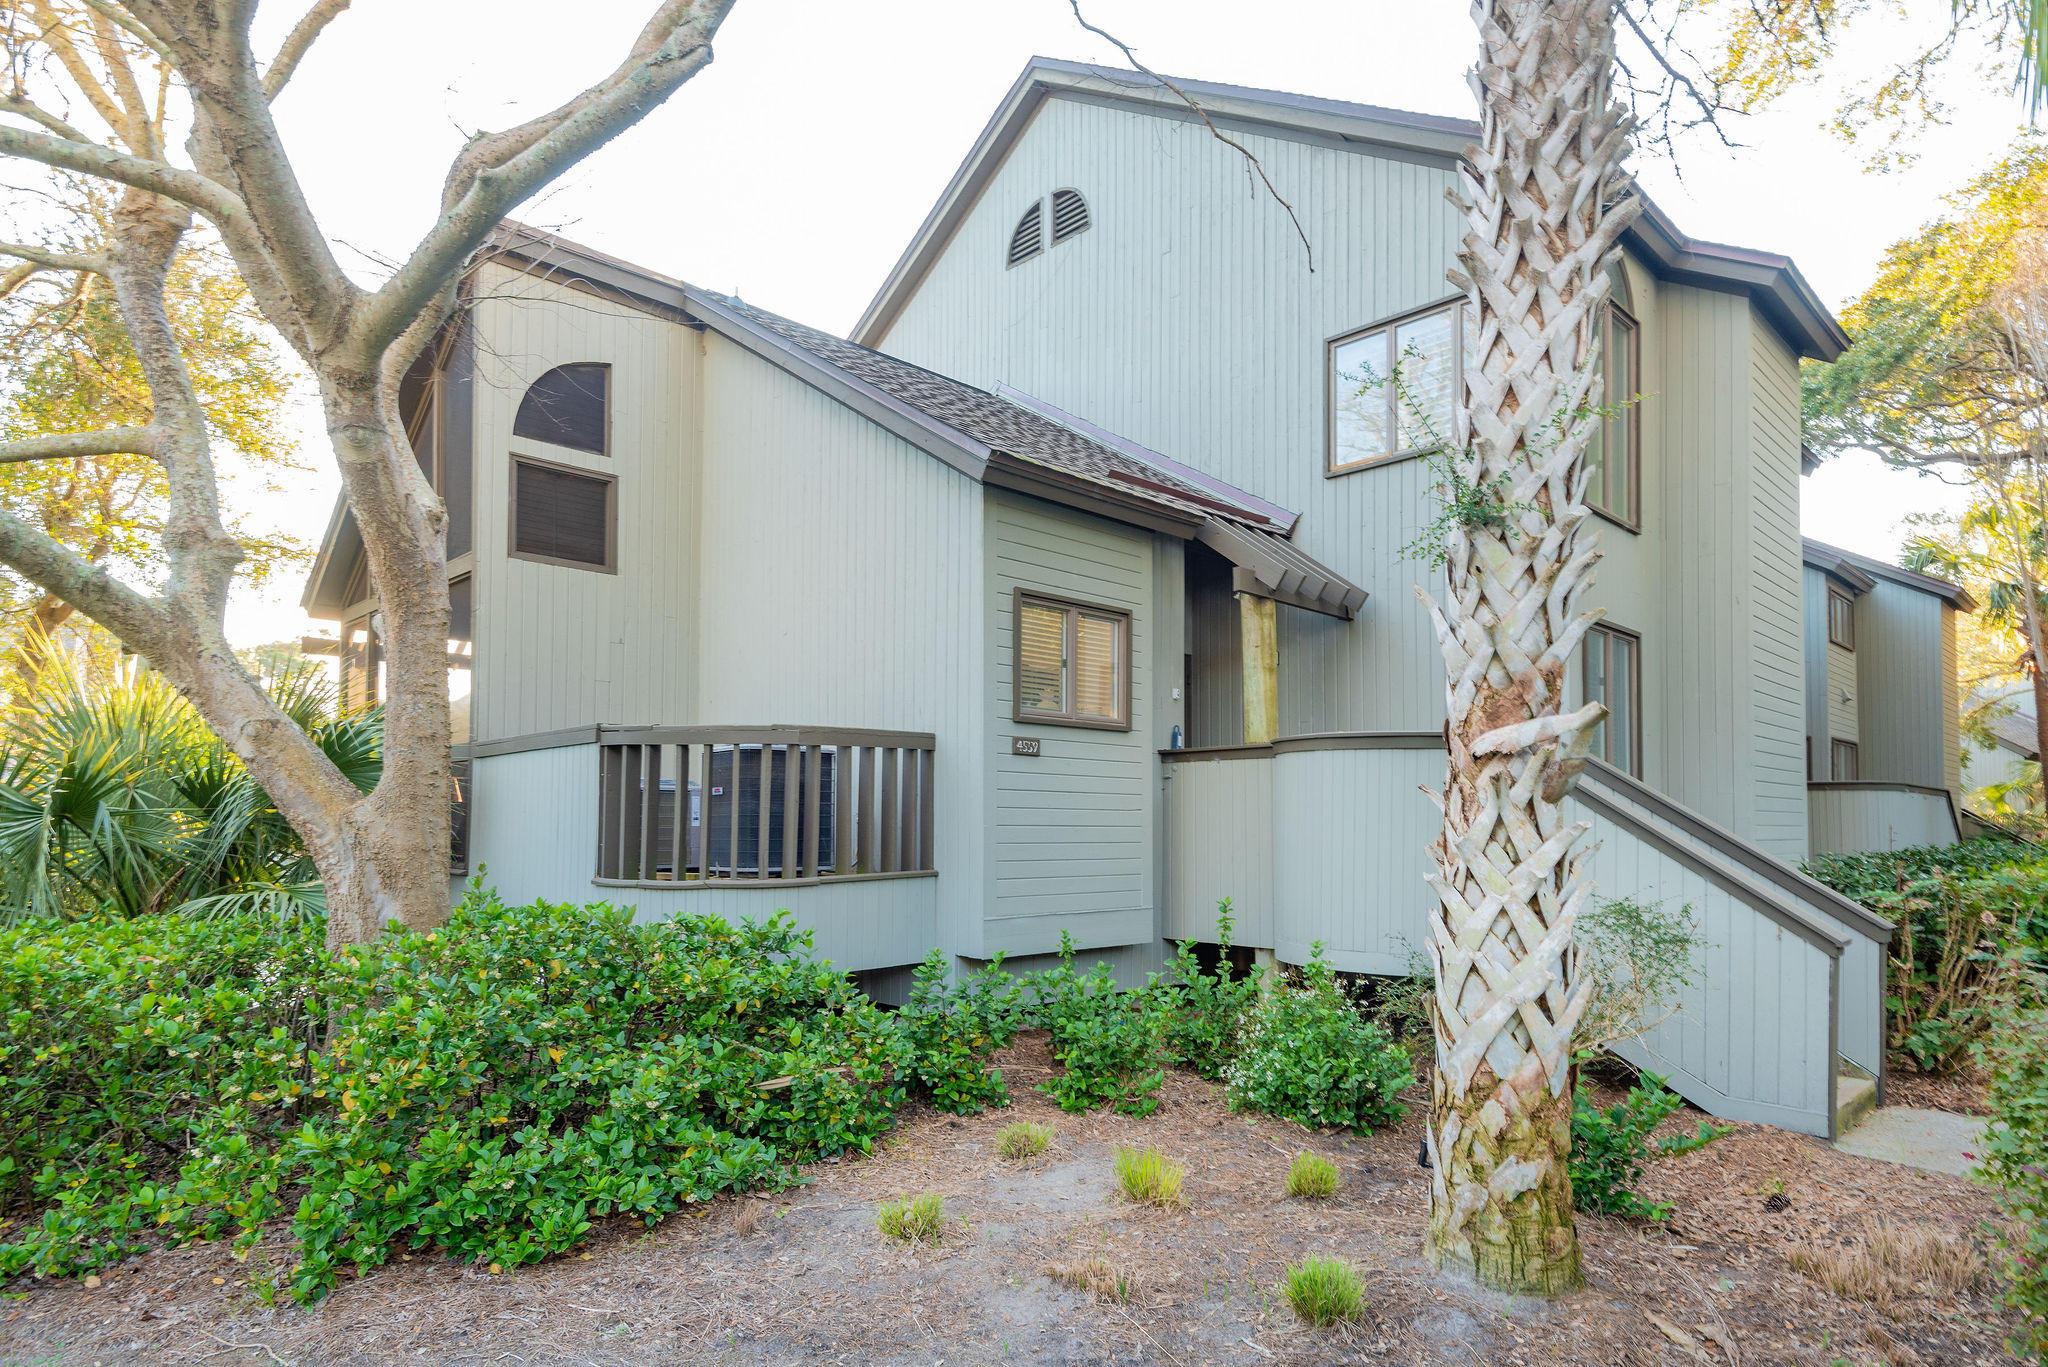 Kiawah Island Homes For Sale - 4559 Park Lake, Kiawah Island, SC - 25